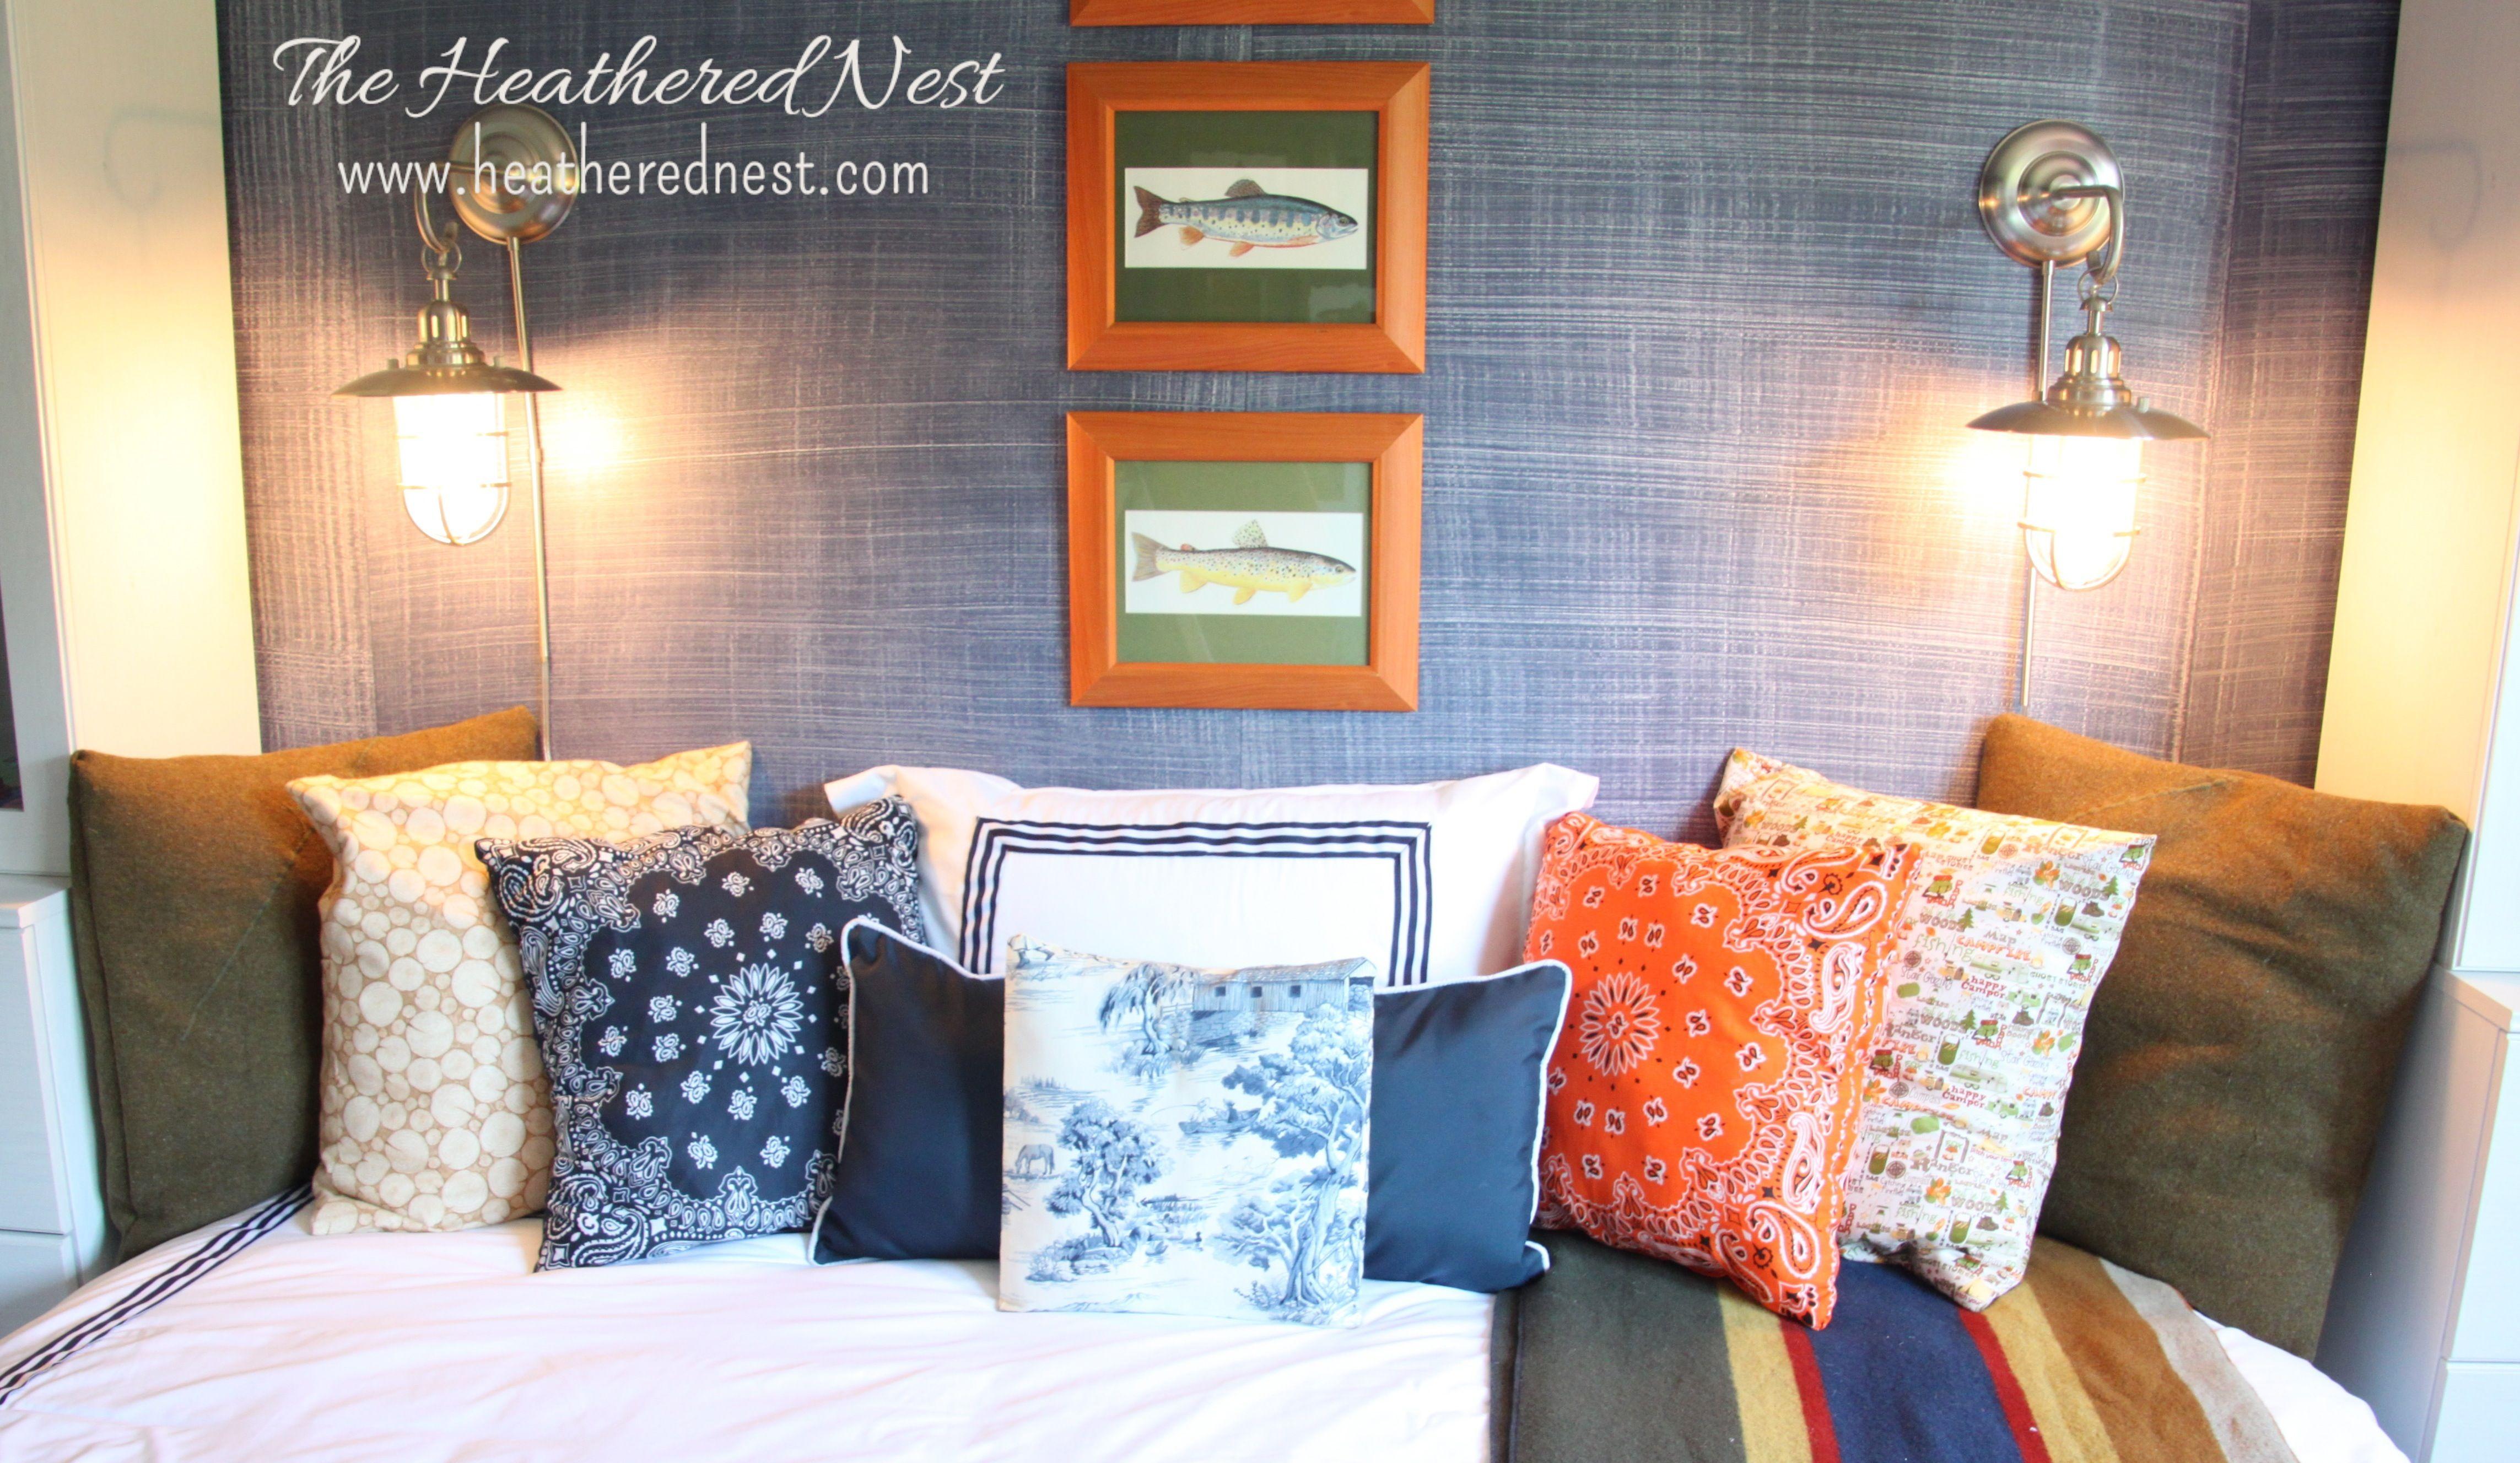 Weure going bandanas diy bandana pillows liven up your living room